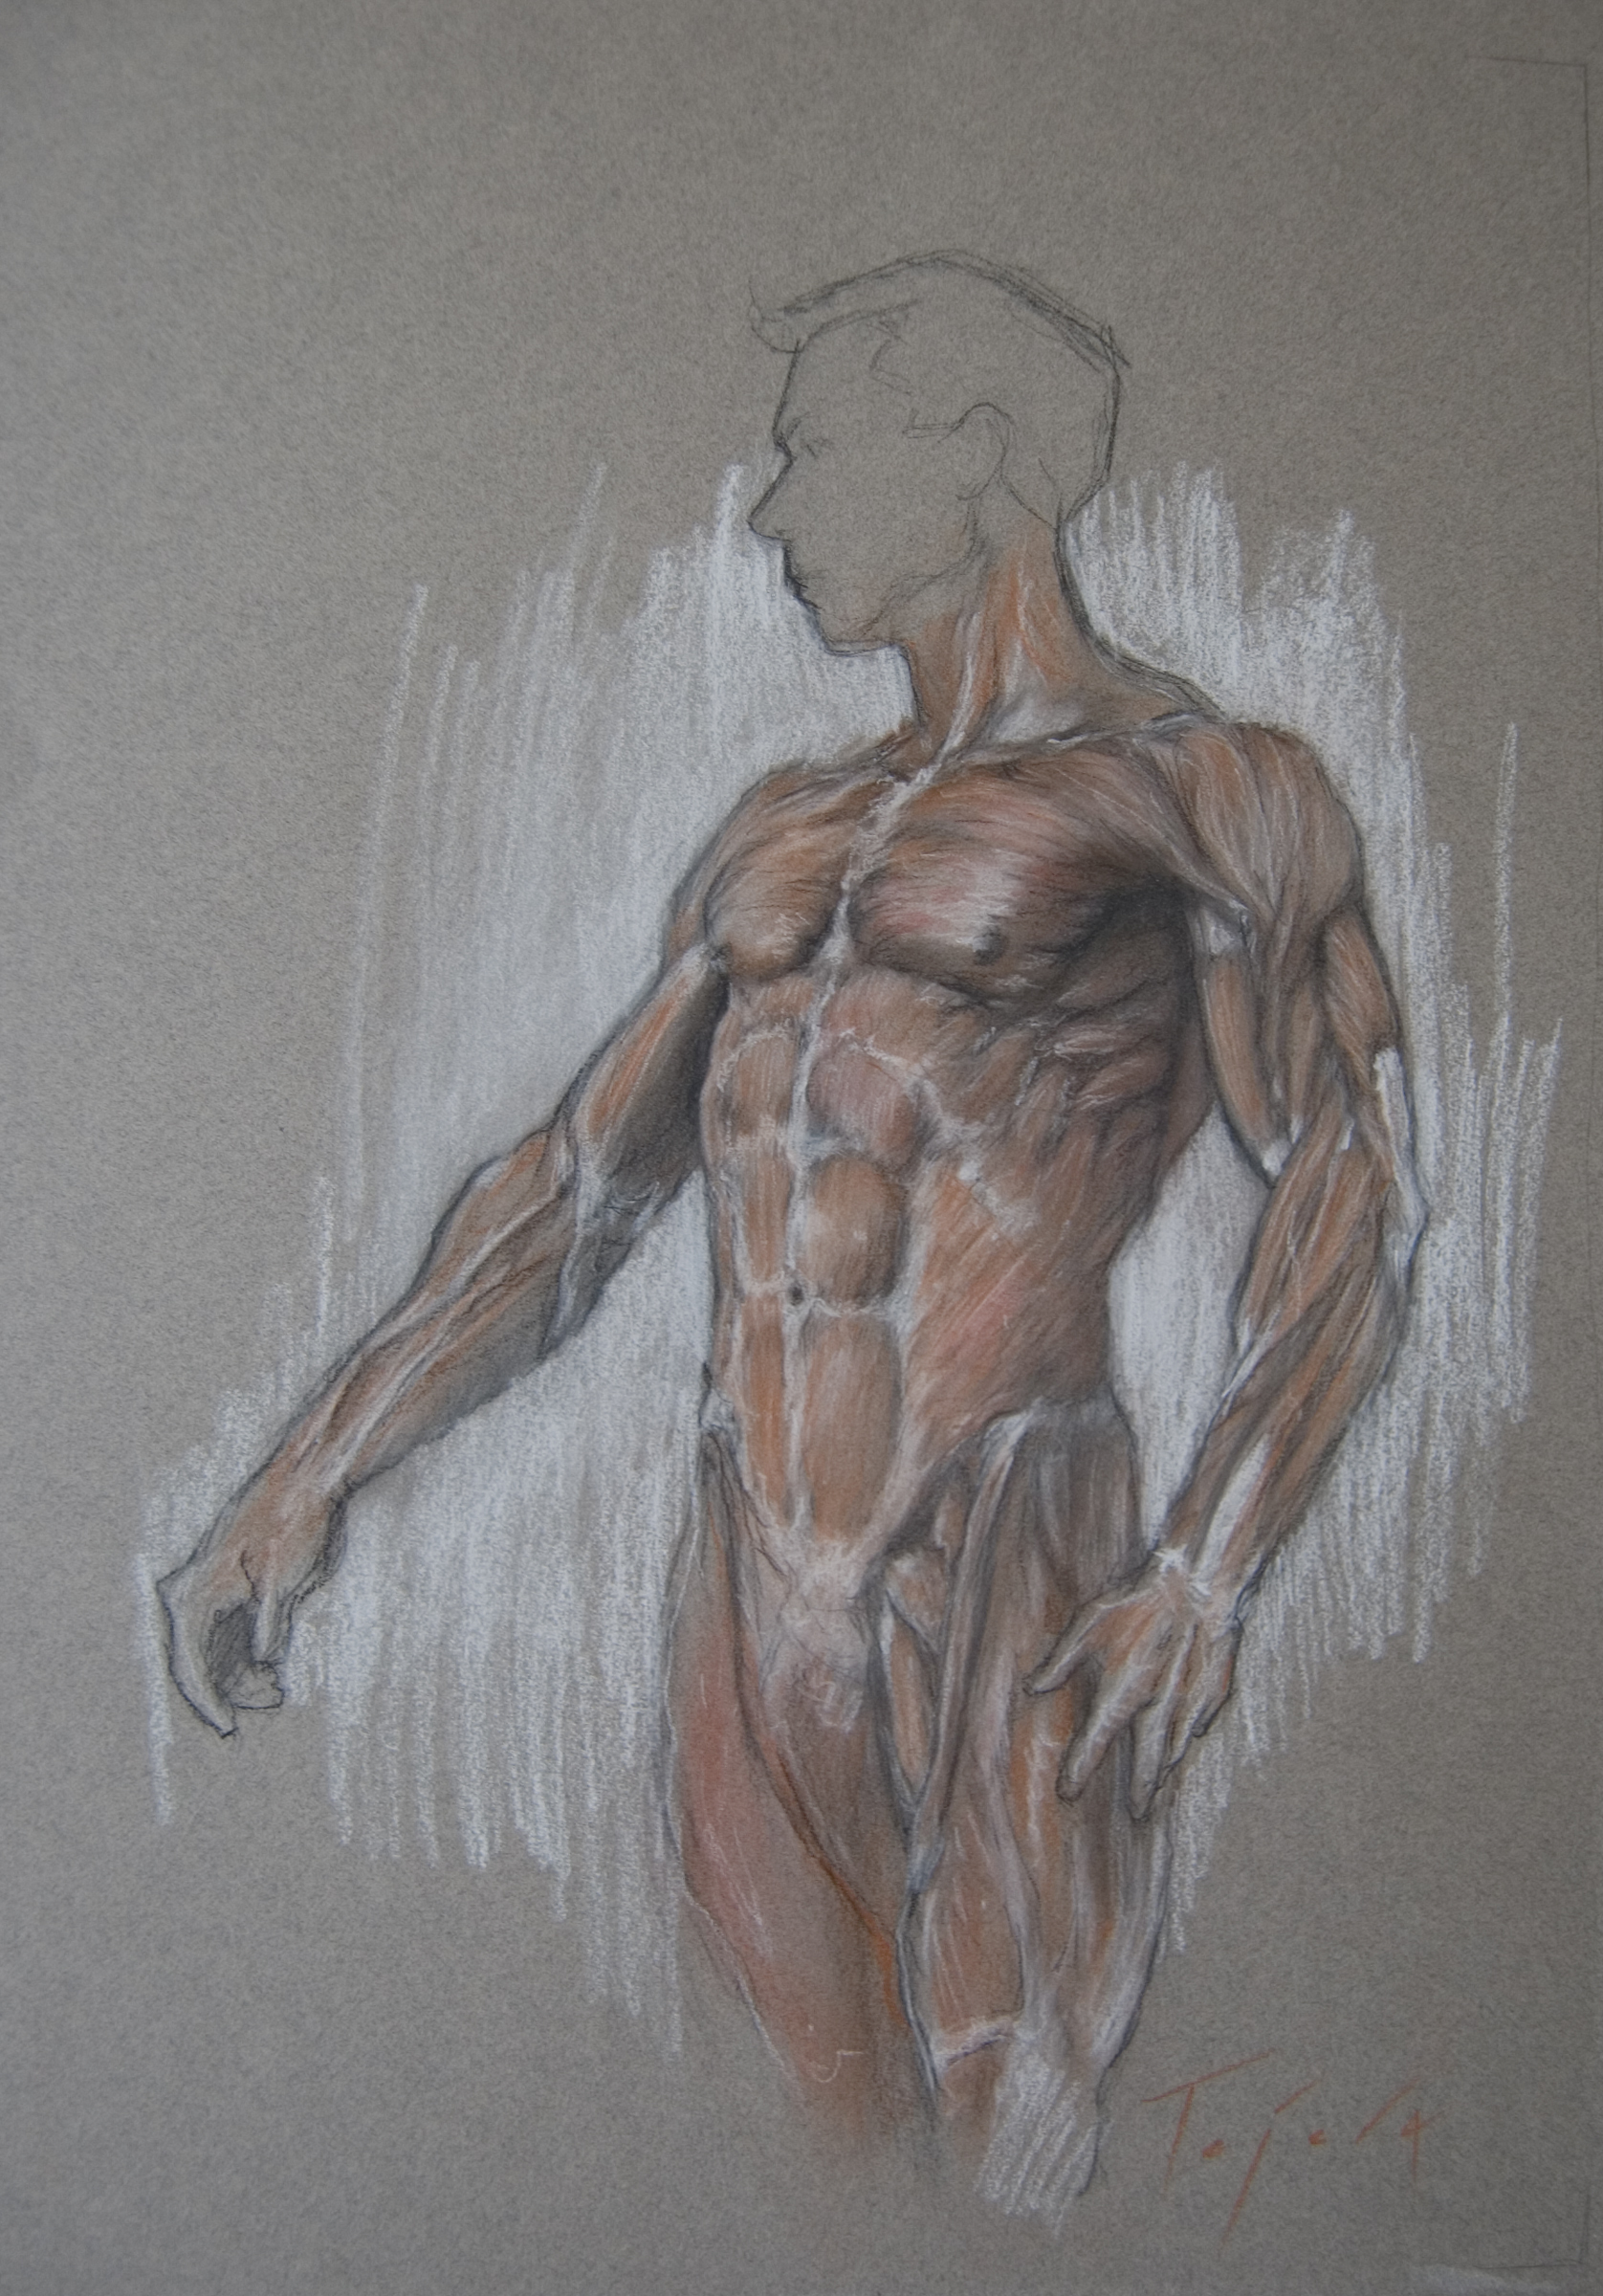 Torso Anatomy | JTejera_Art | Foundmyself